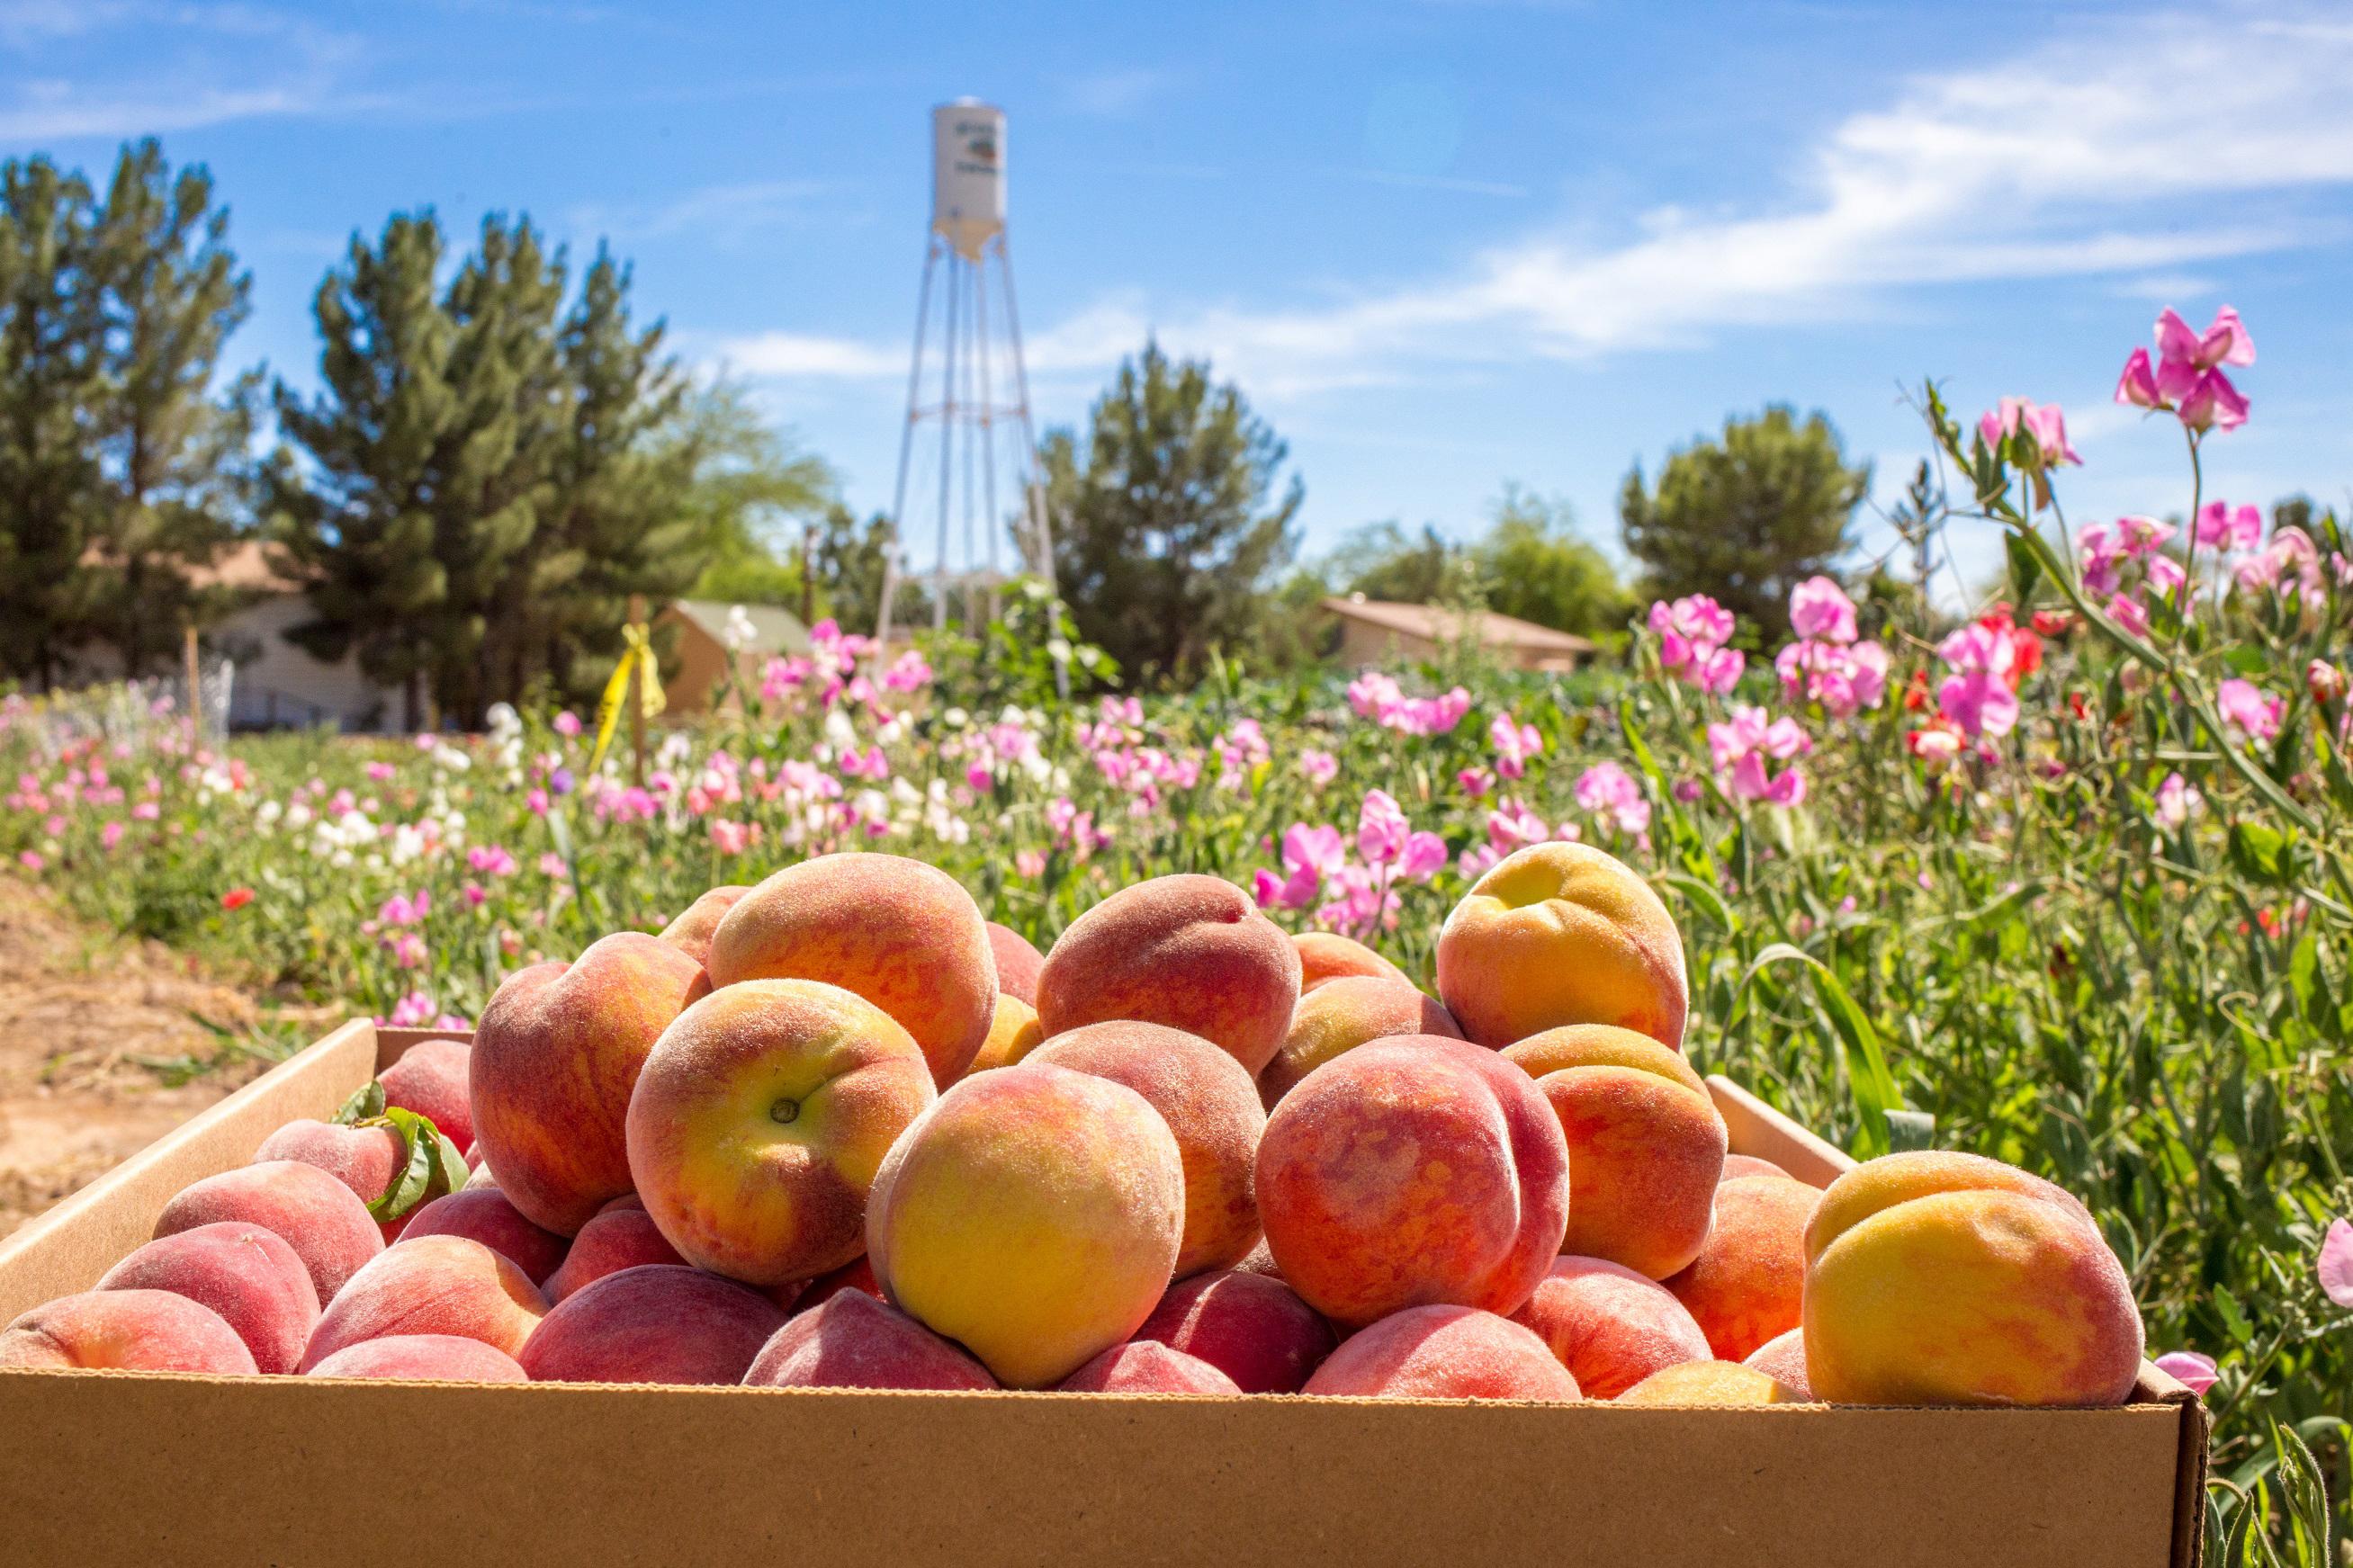 Arizona_Schnepf-Farms-Peach-Festival-photo-credit-Visit-Mesa.jpg?mtime=20170526115503#asset:77892